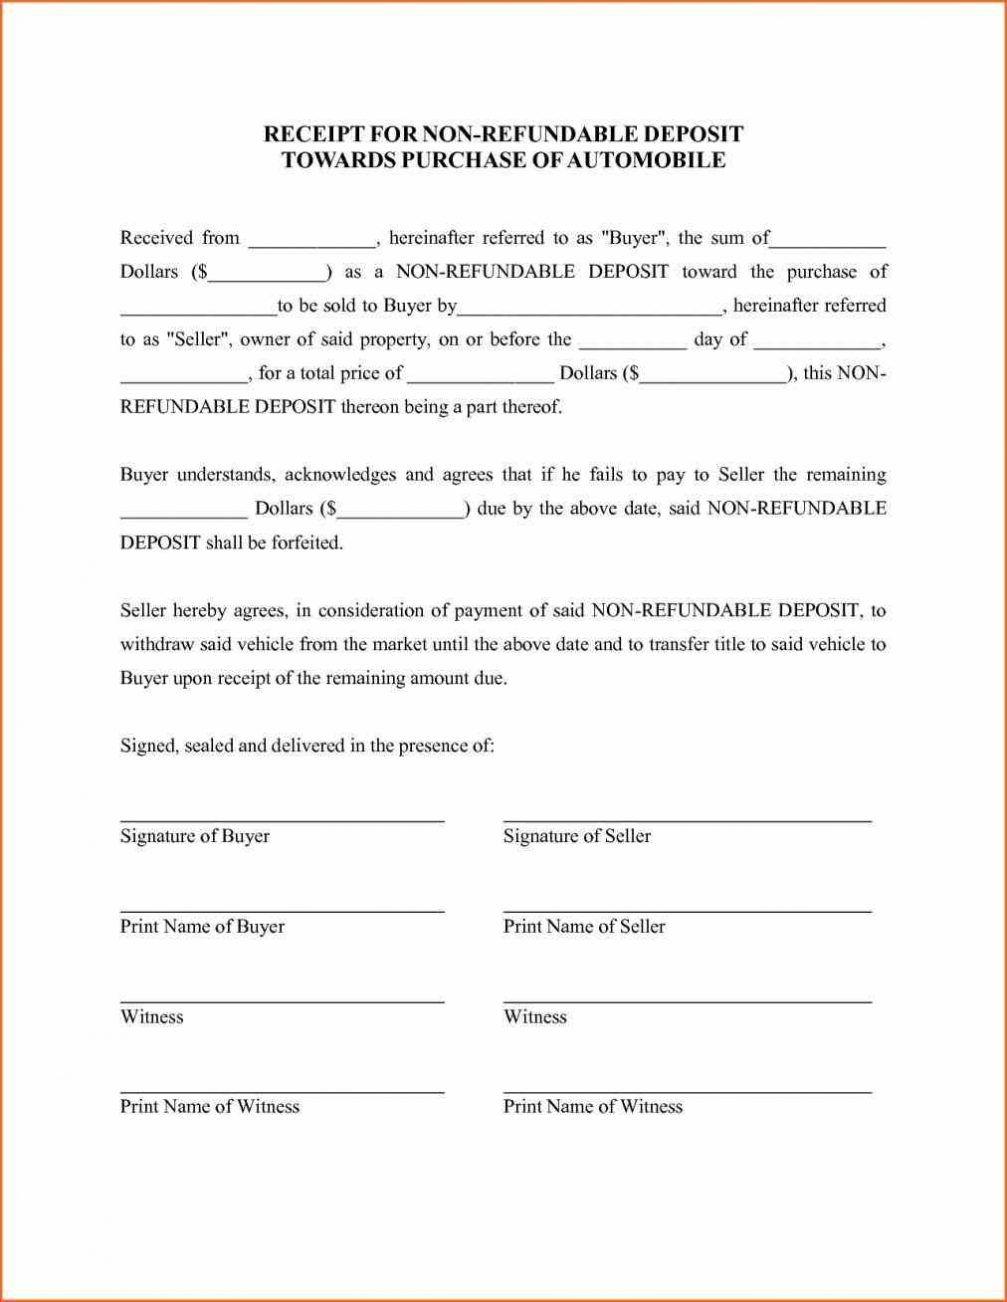 deposit authorization form printable pdf templates letter